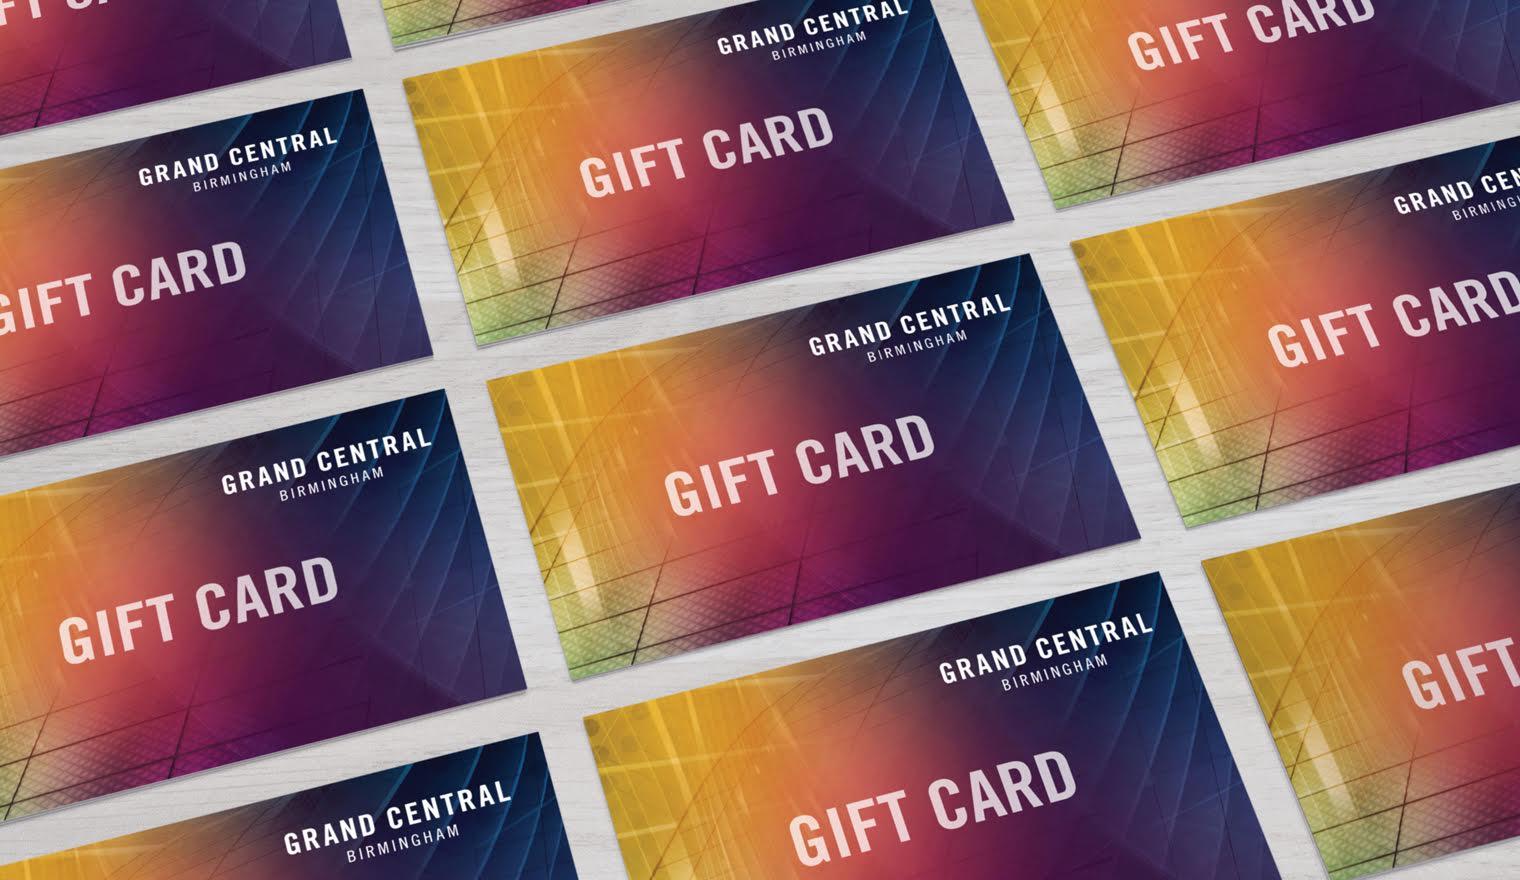 Gift Card Design for Grand Central Birmingham